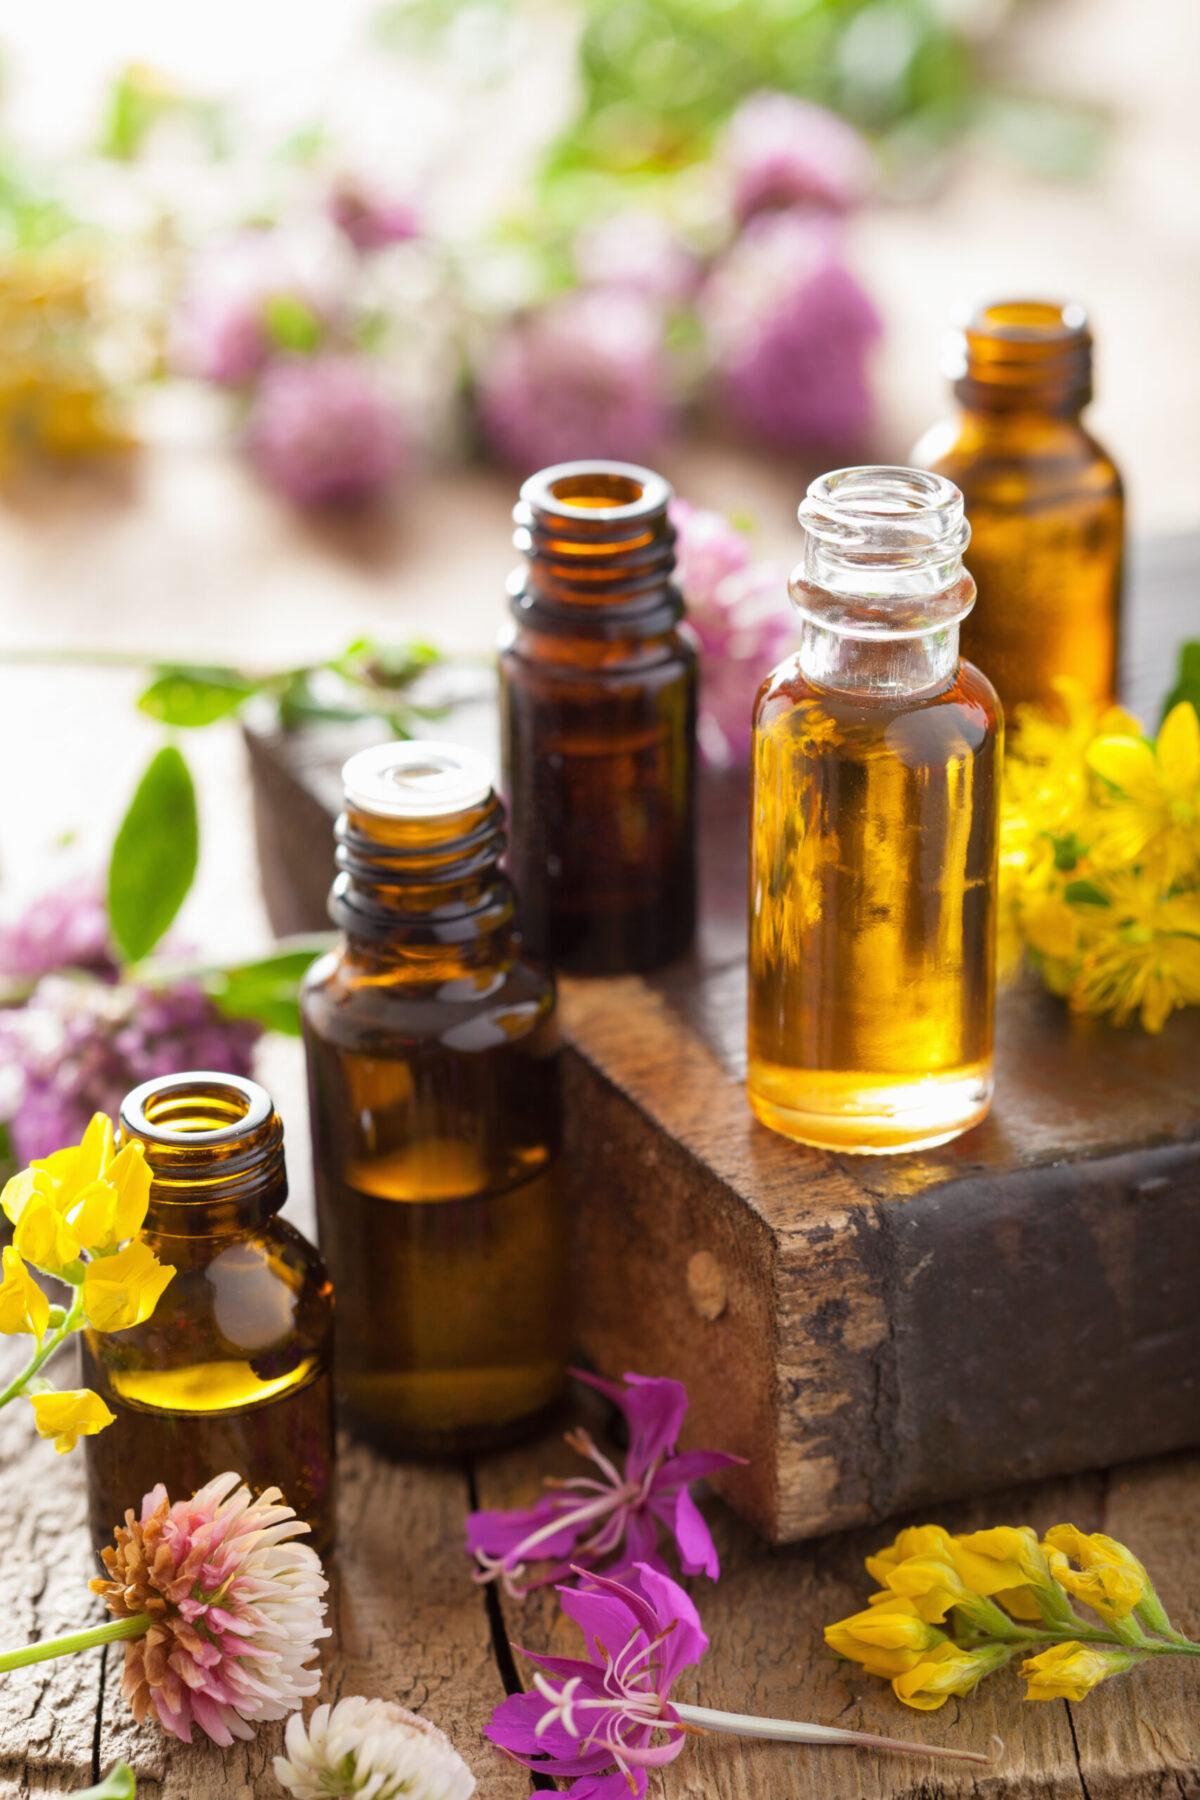 essential oil recipes for roller bottles